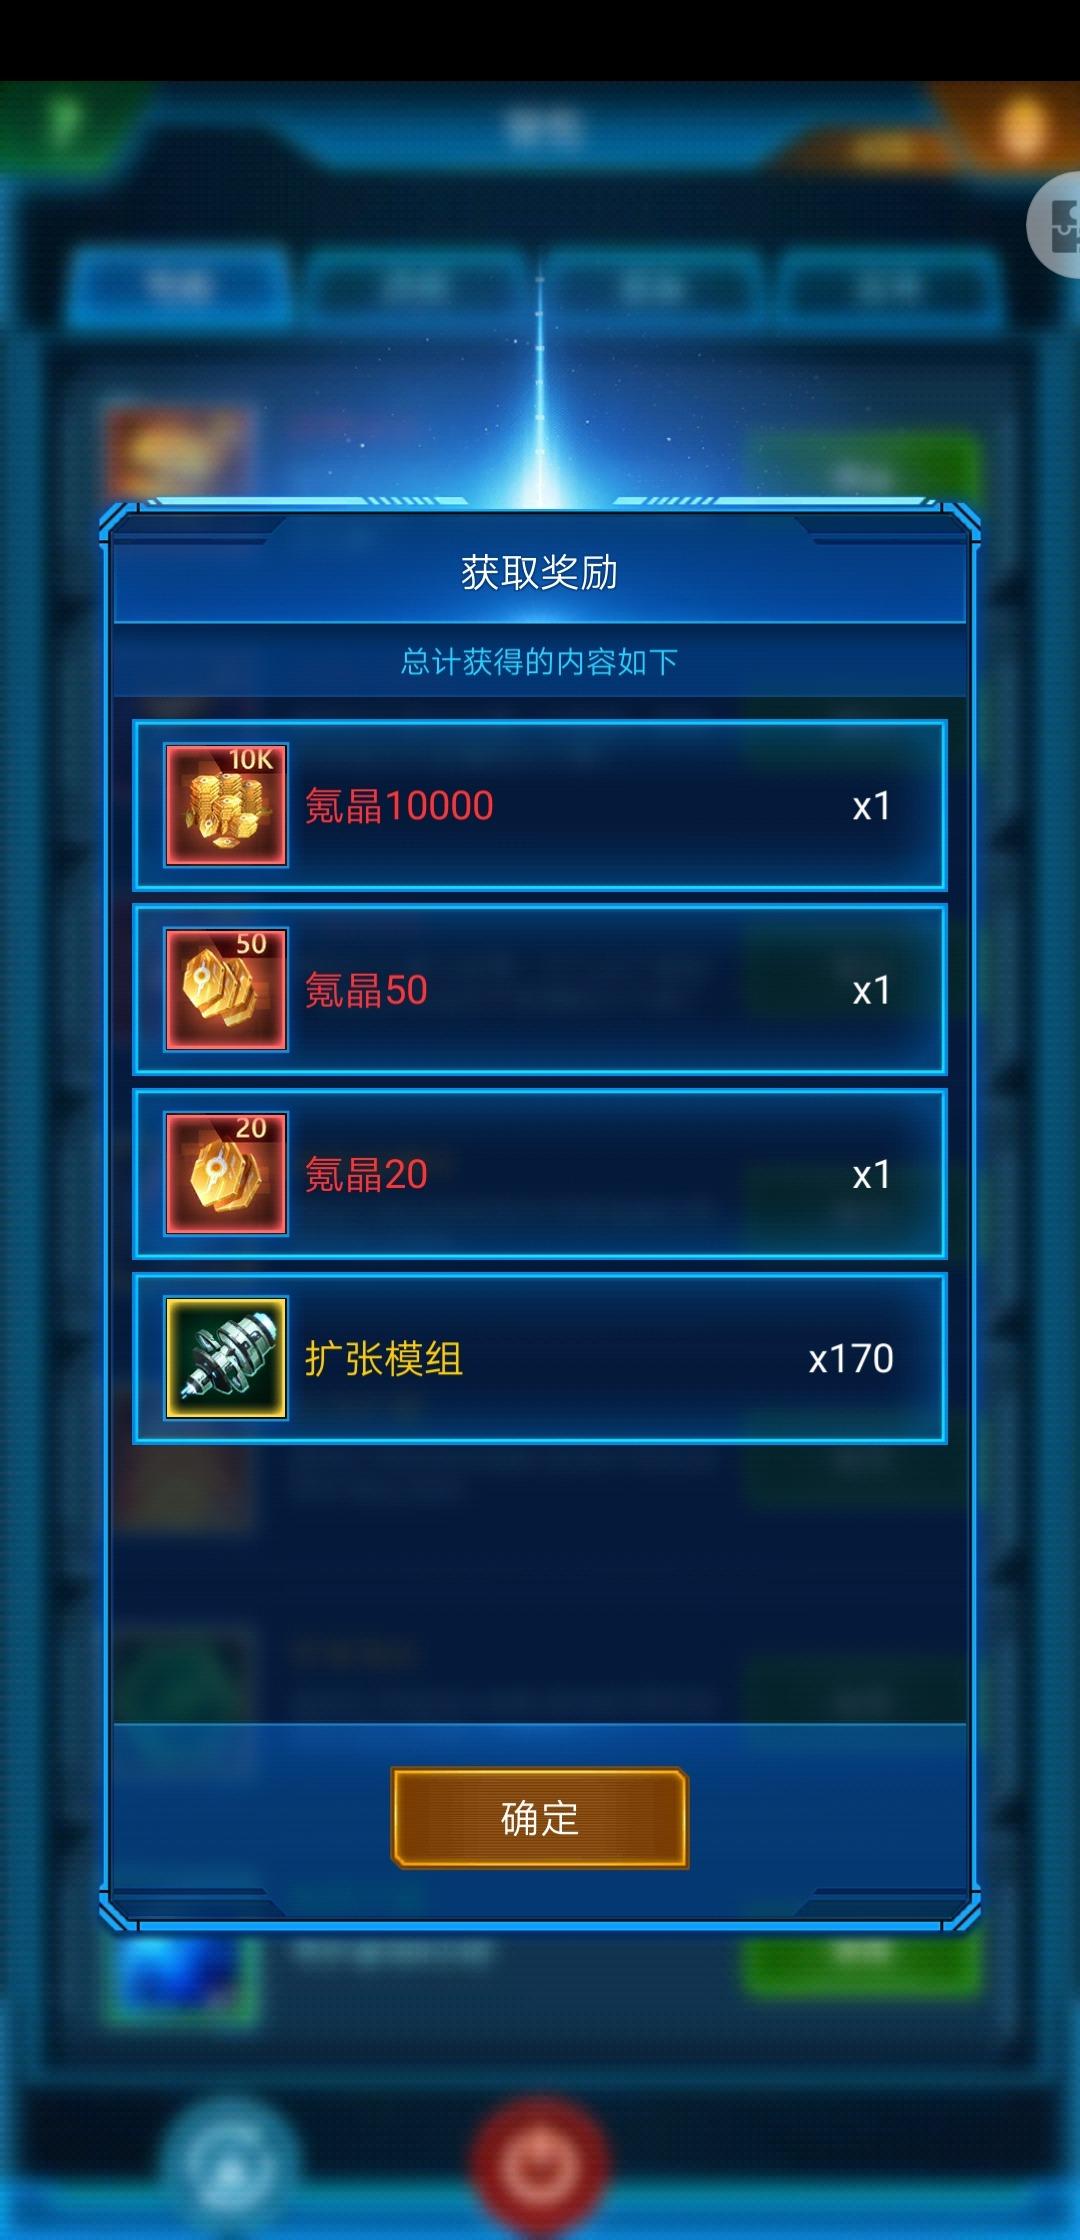 Screenshot_20190809_000136_com.jedigames.p16s.huawei.jpg